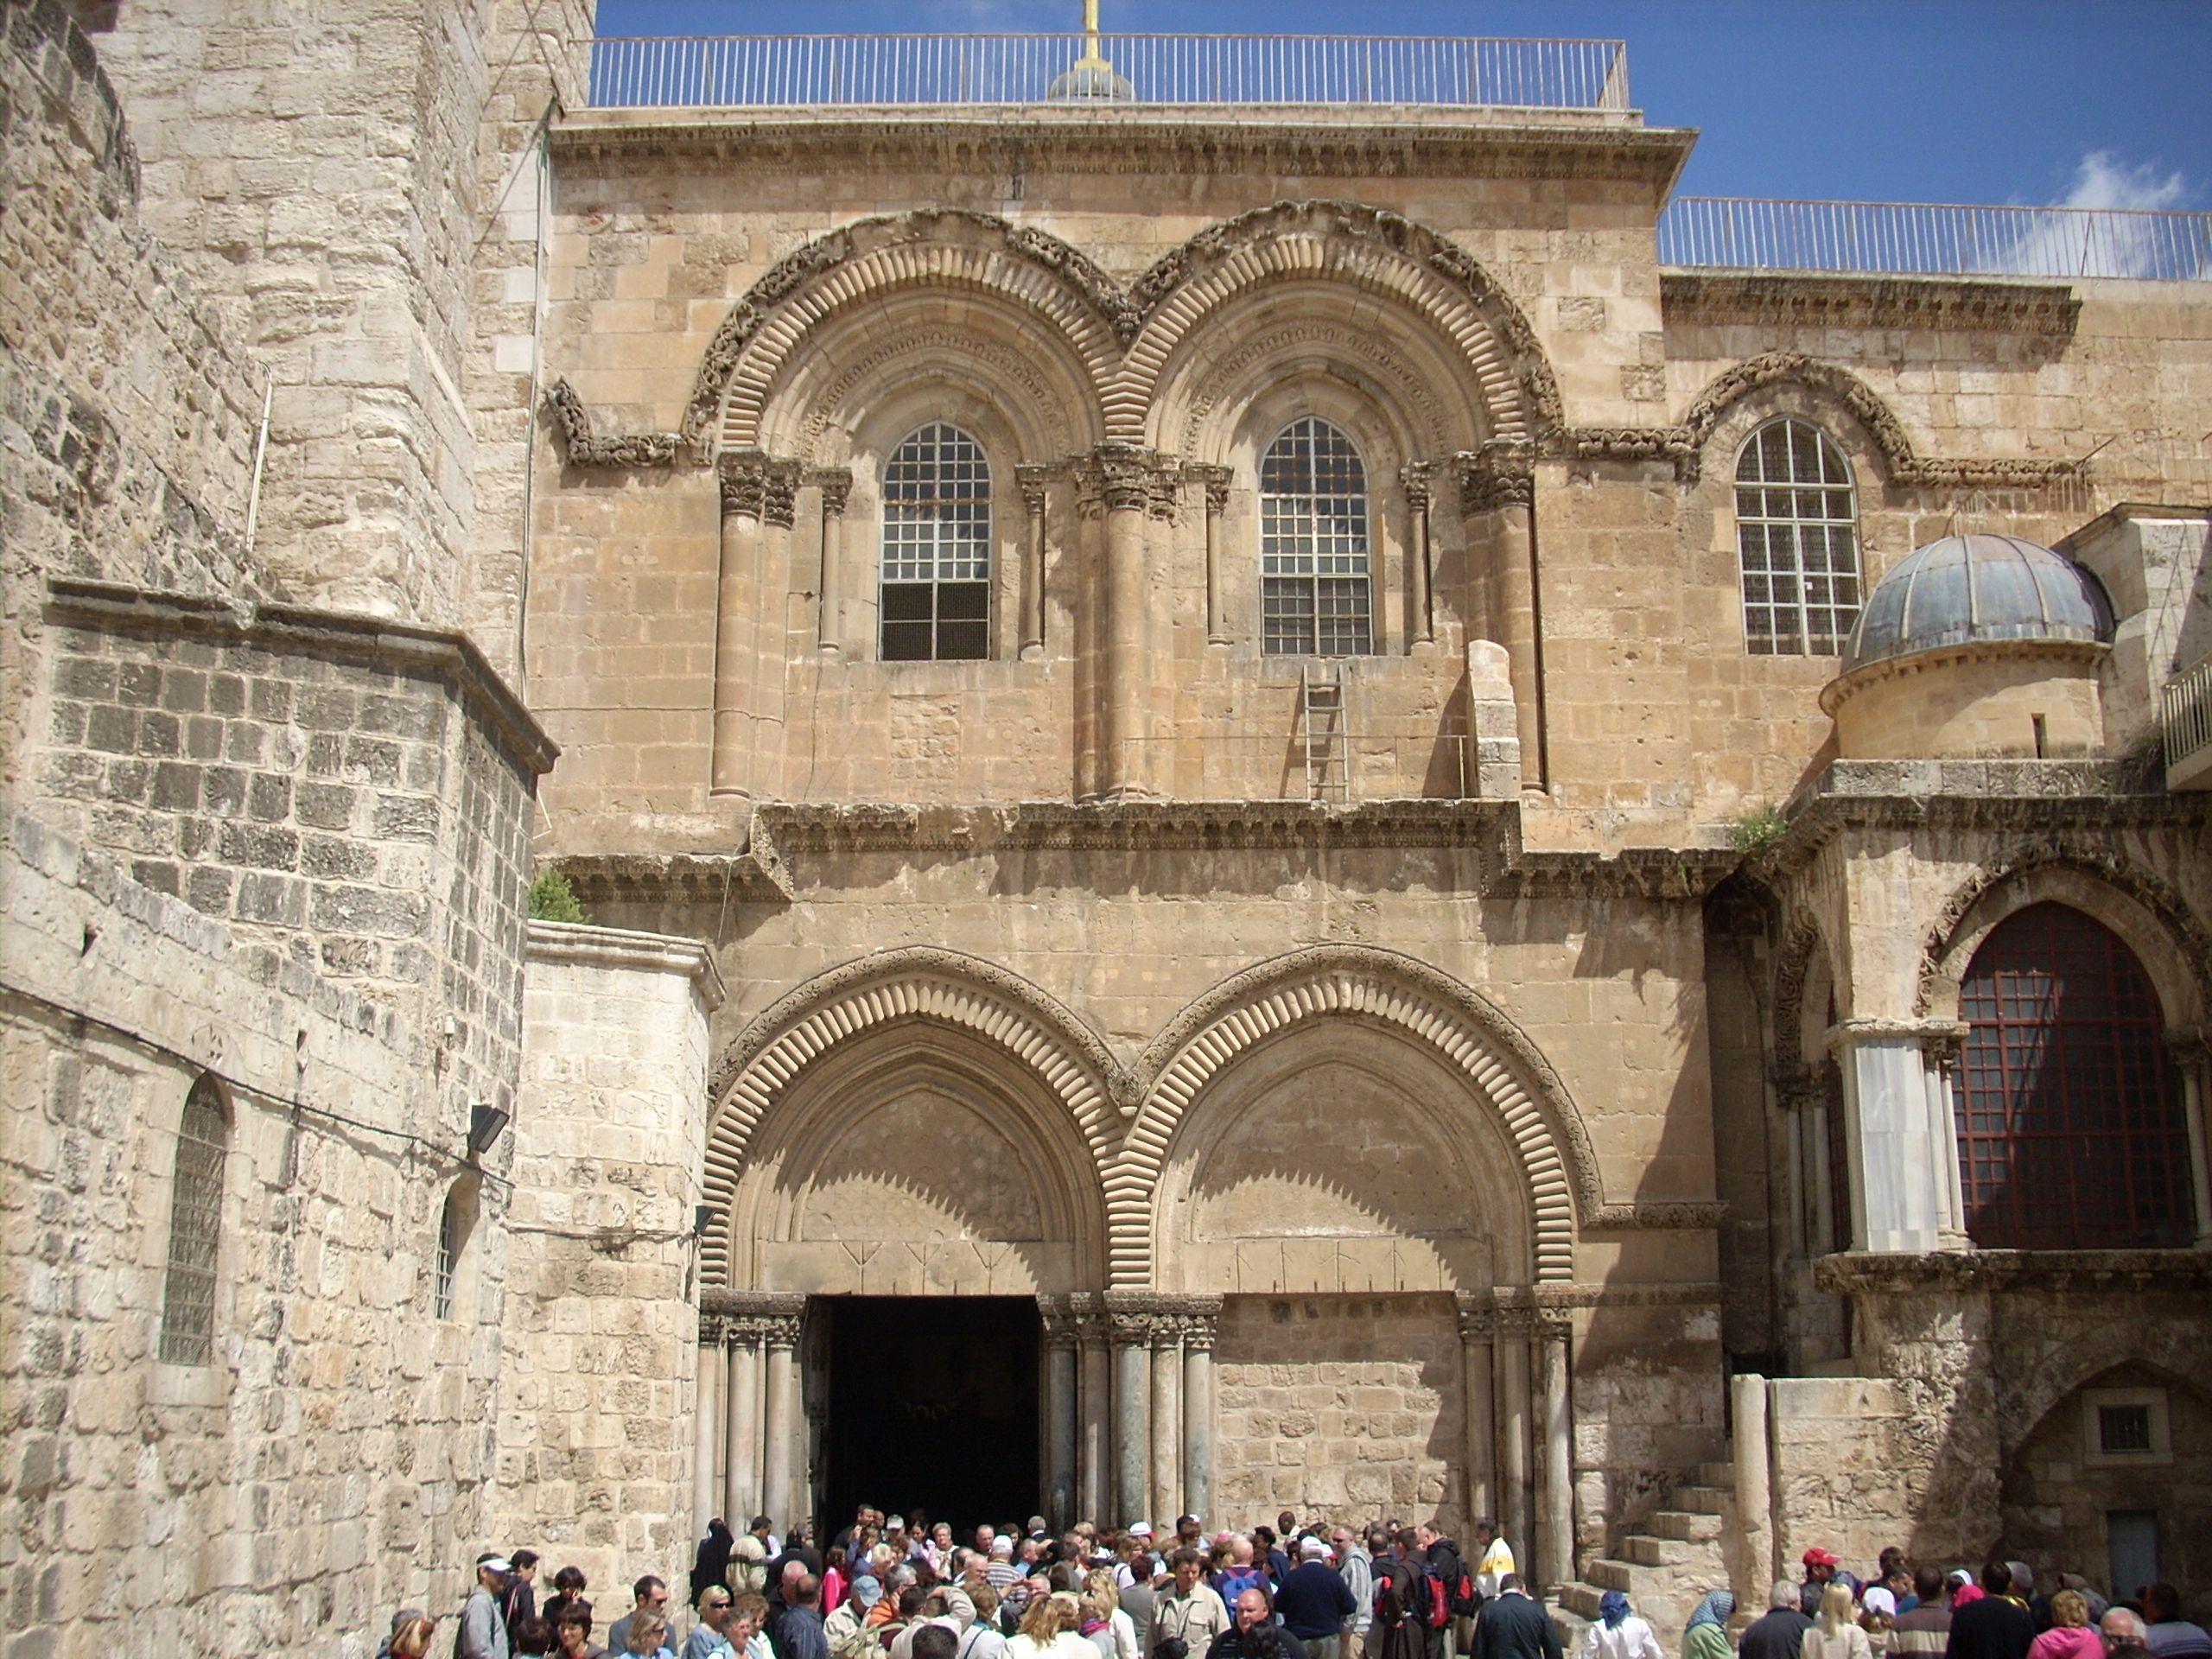 Basílica del Santo Sepulcro www.elpapaenisrael.com #ElPapaEnIsrael